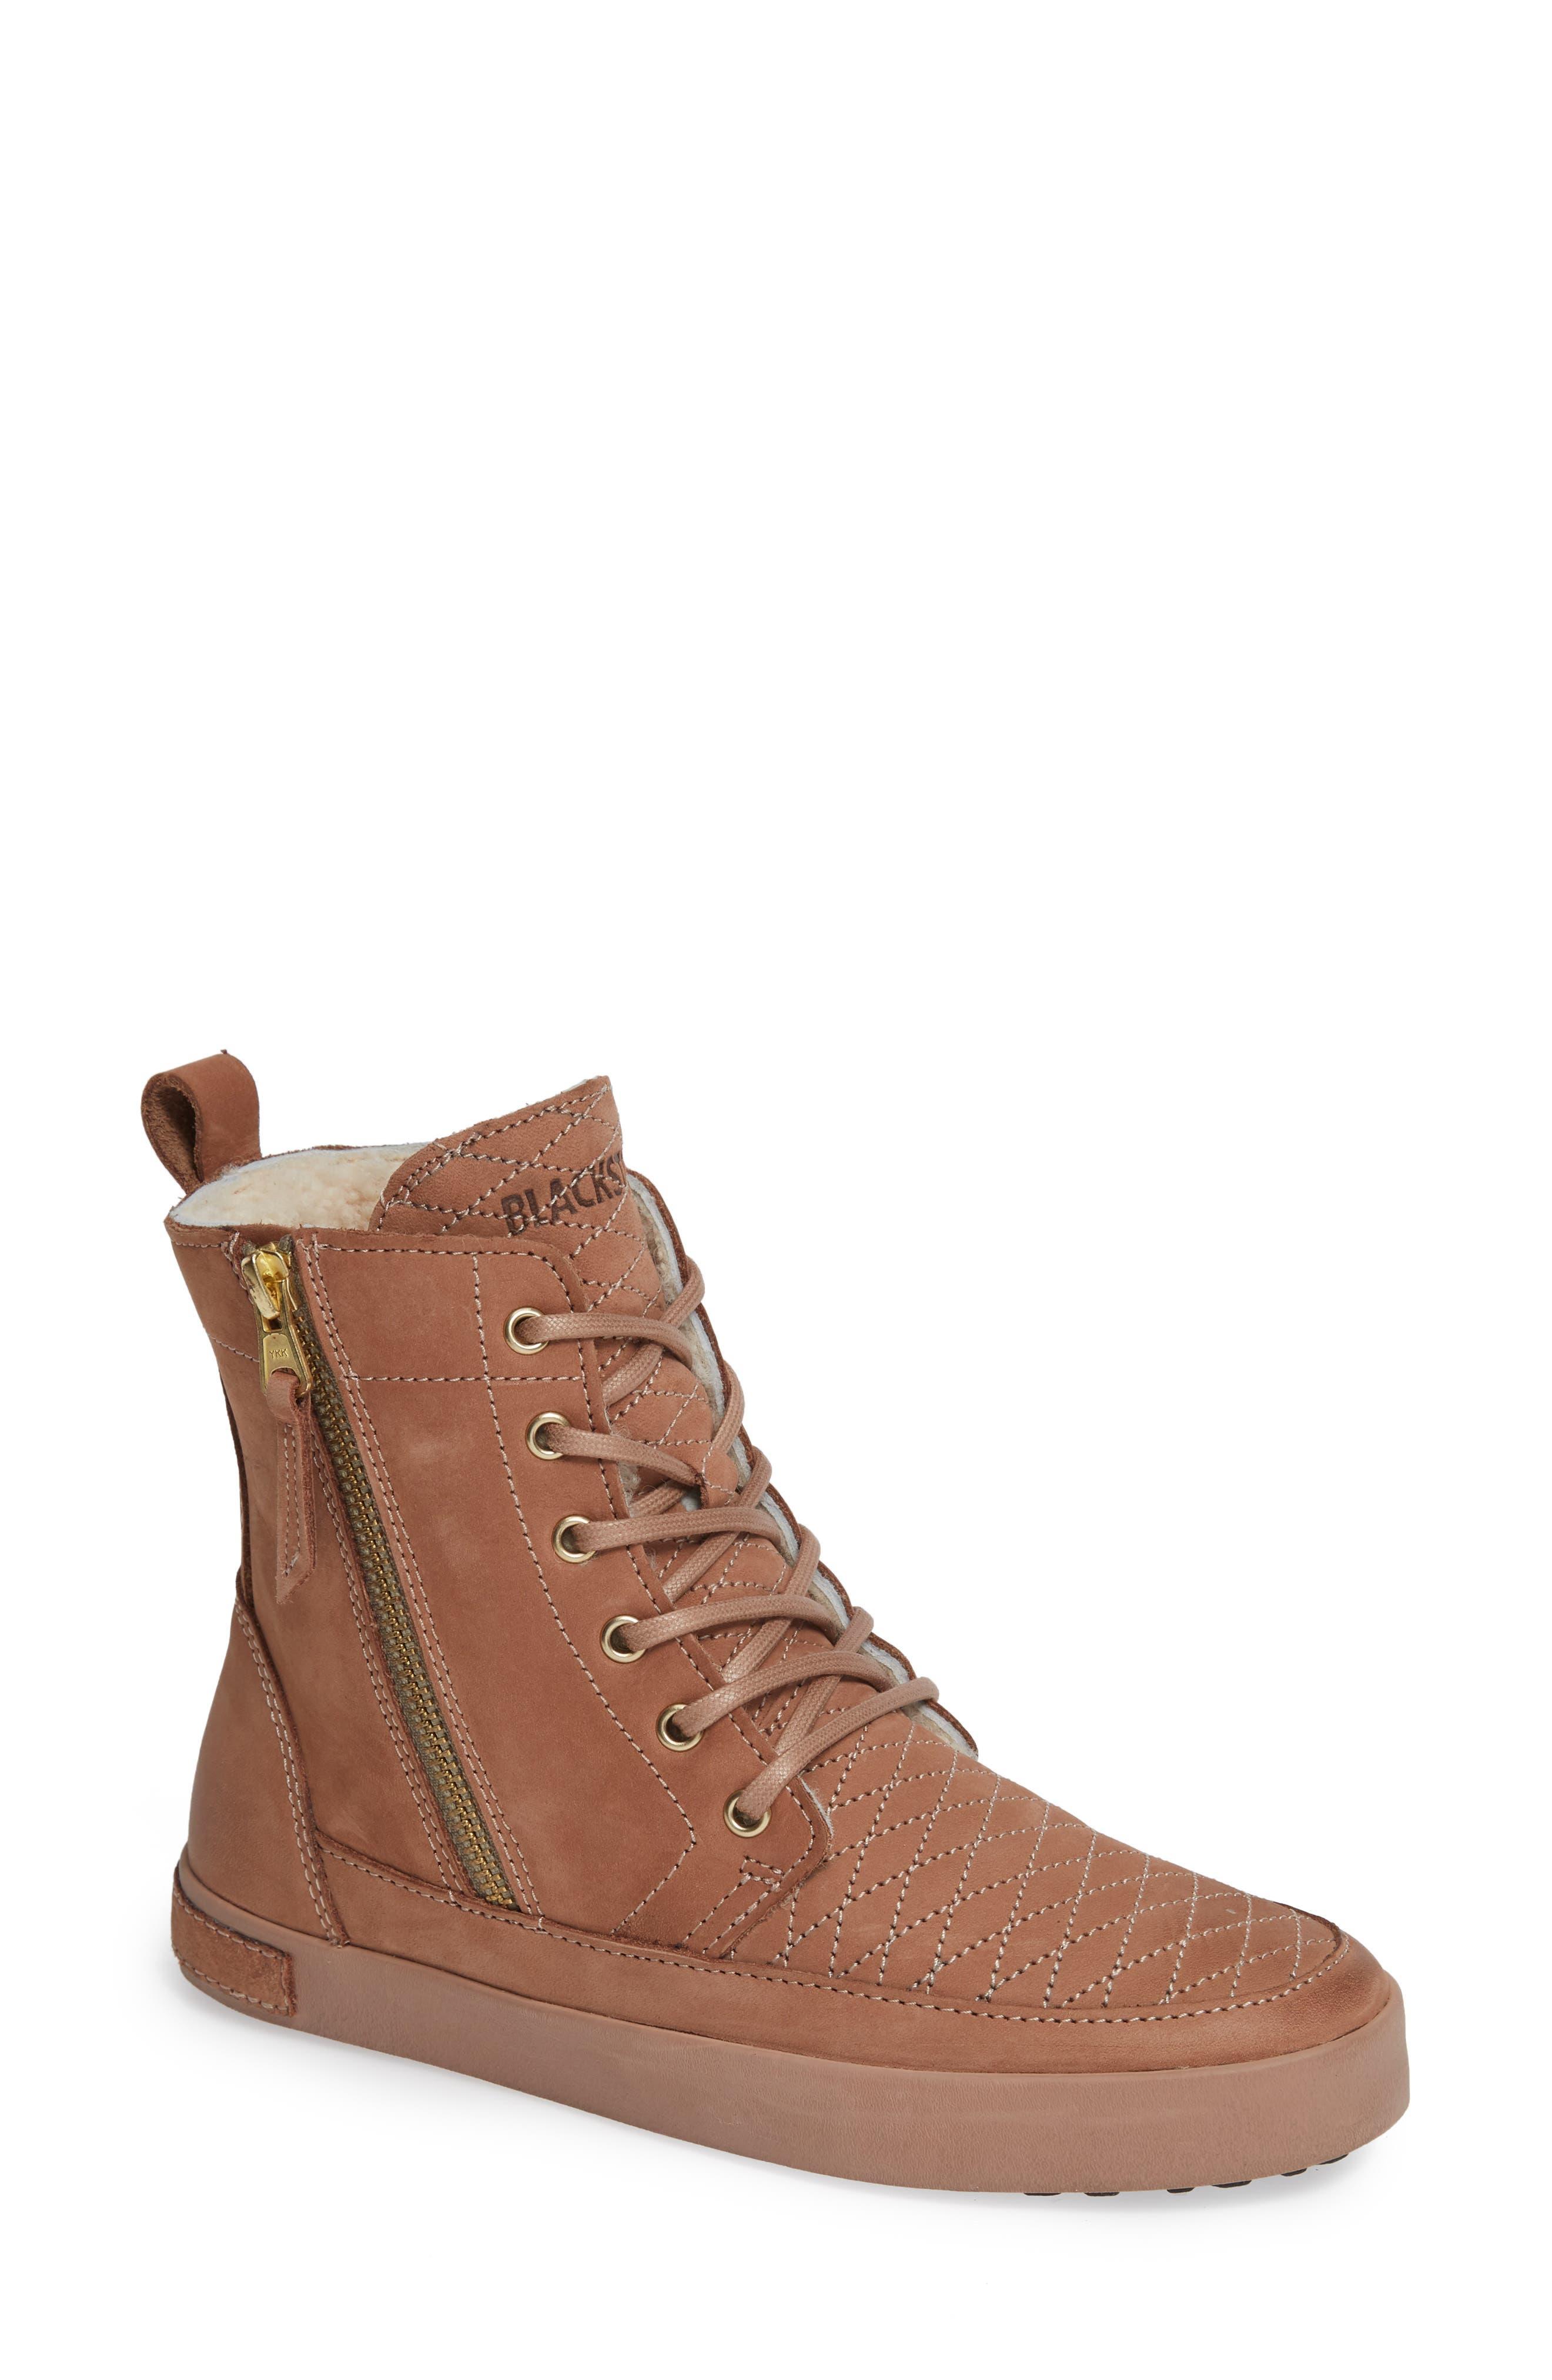 Blackstone Ql64 High Top Sneaker With Genuine Shearling Lining, Beige